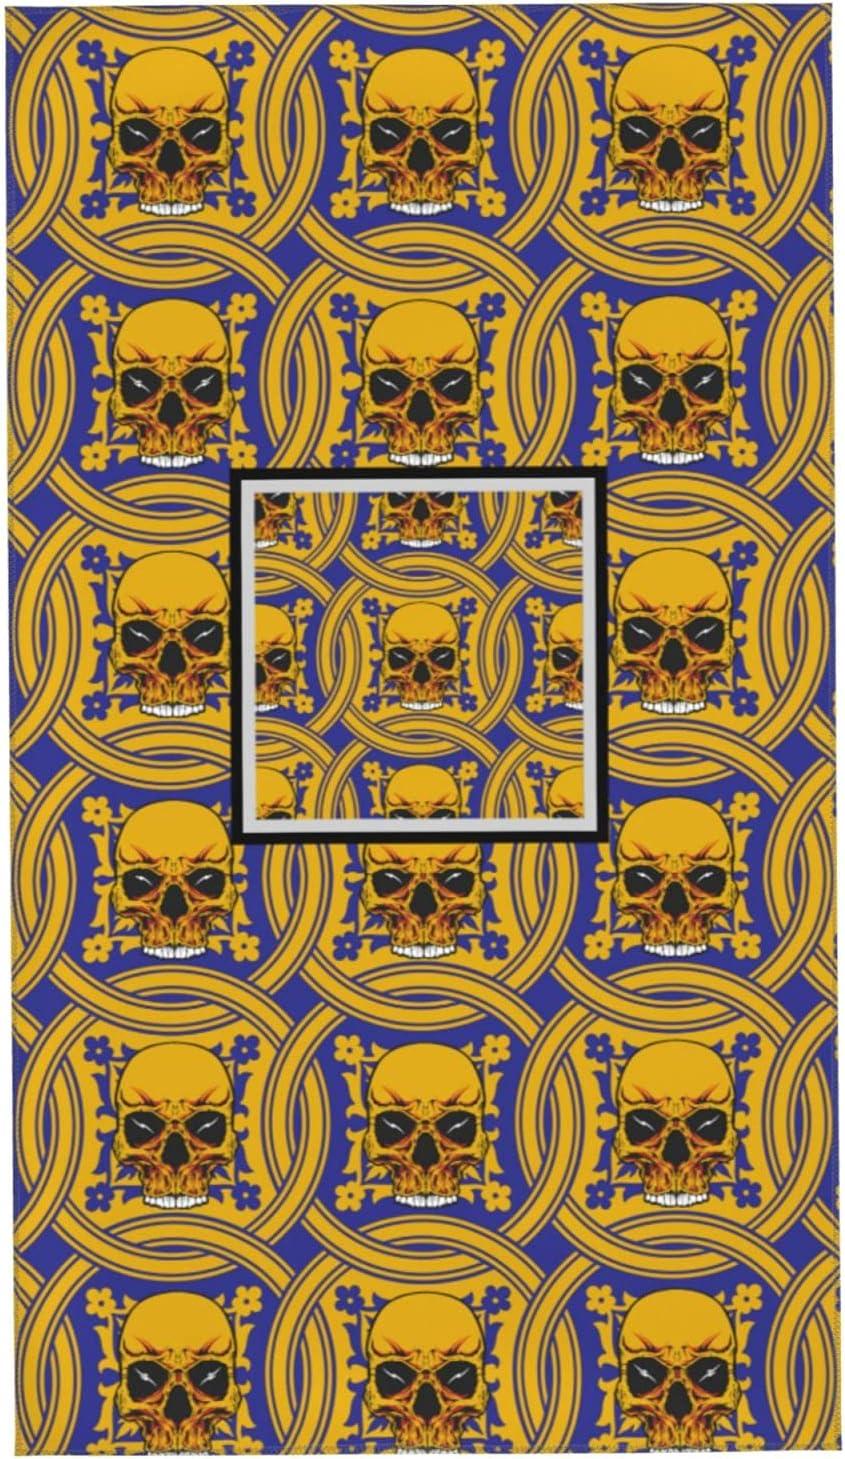 Halloween Golden Skull Towel Comfo Max 64% OFF Bath Skin-Friendly Soft Arlington Mall